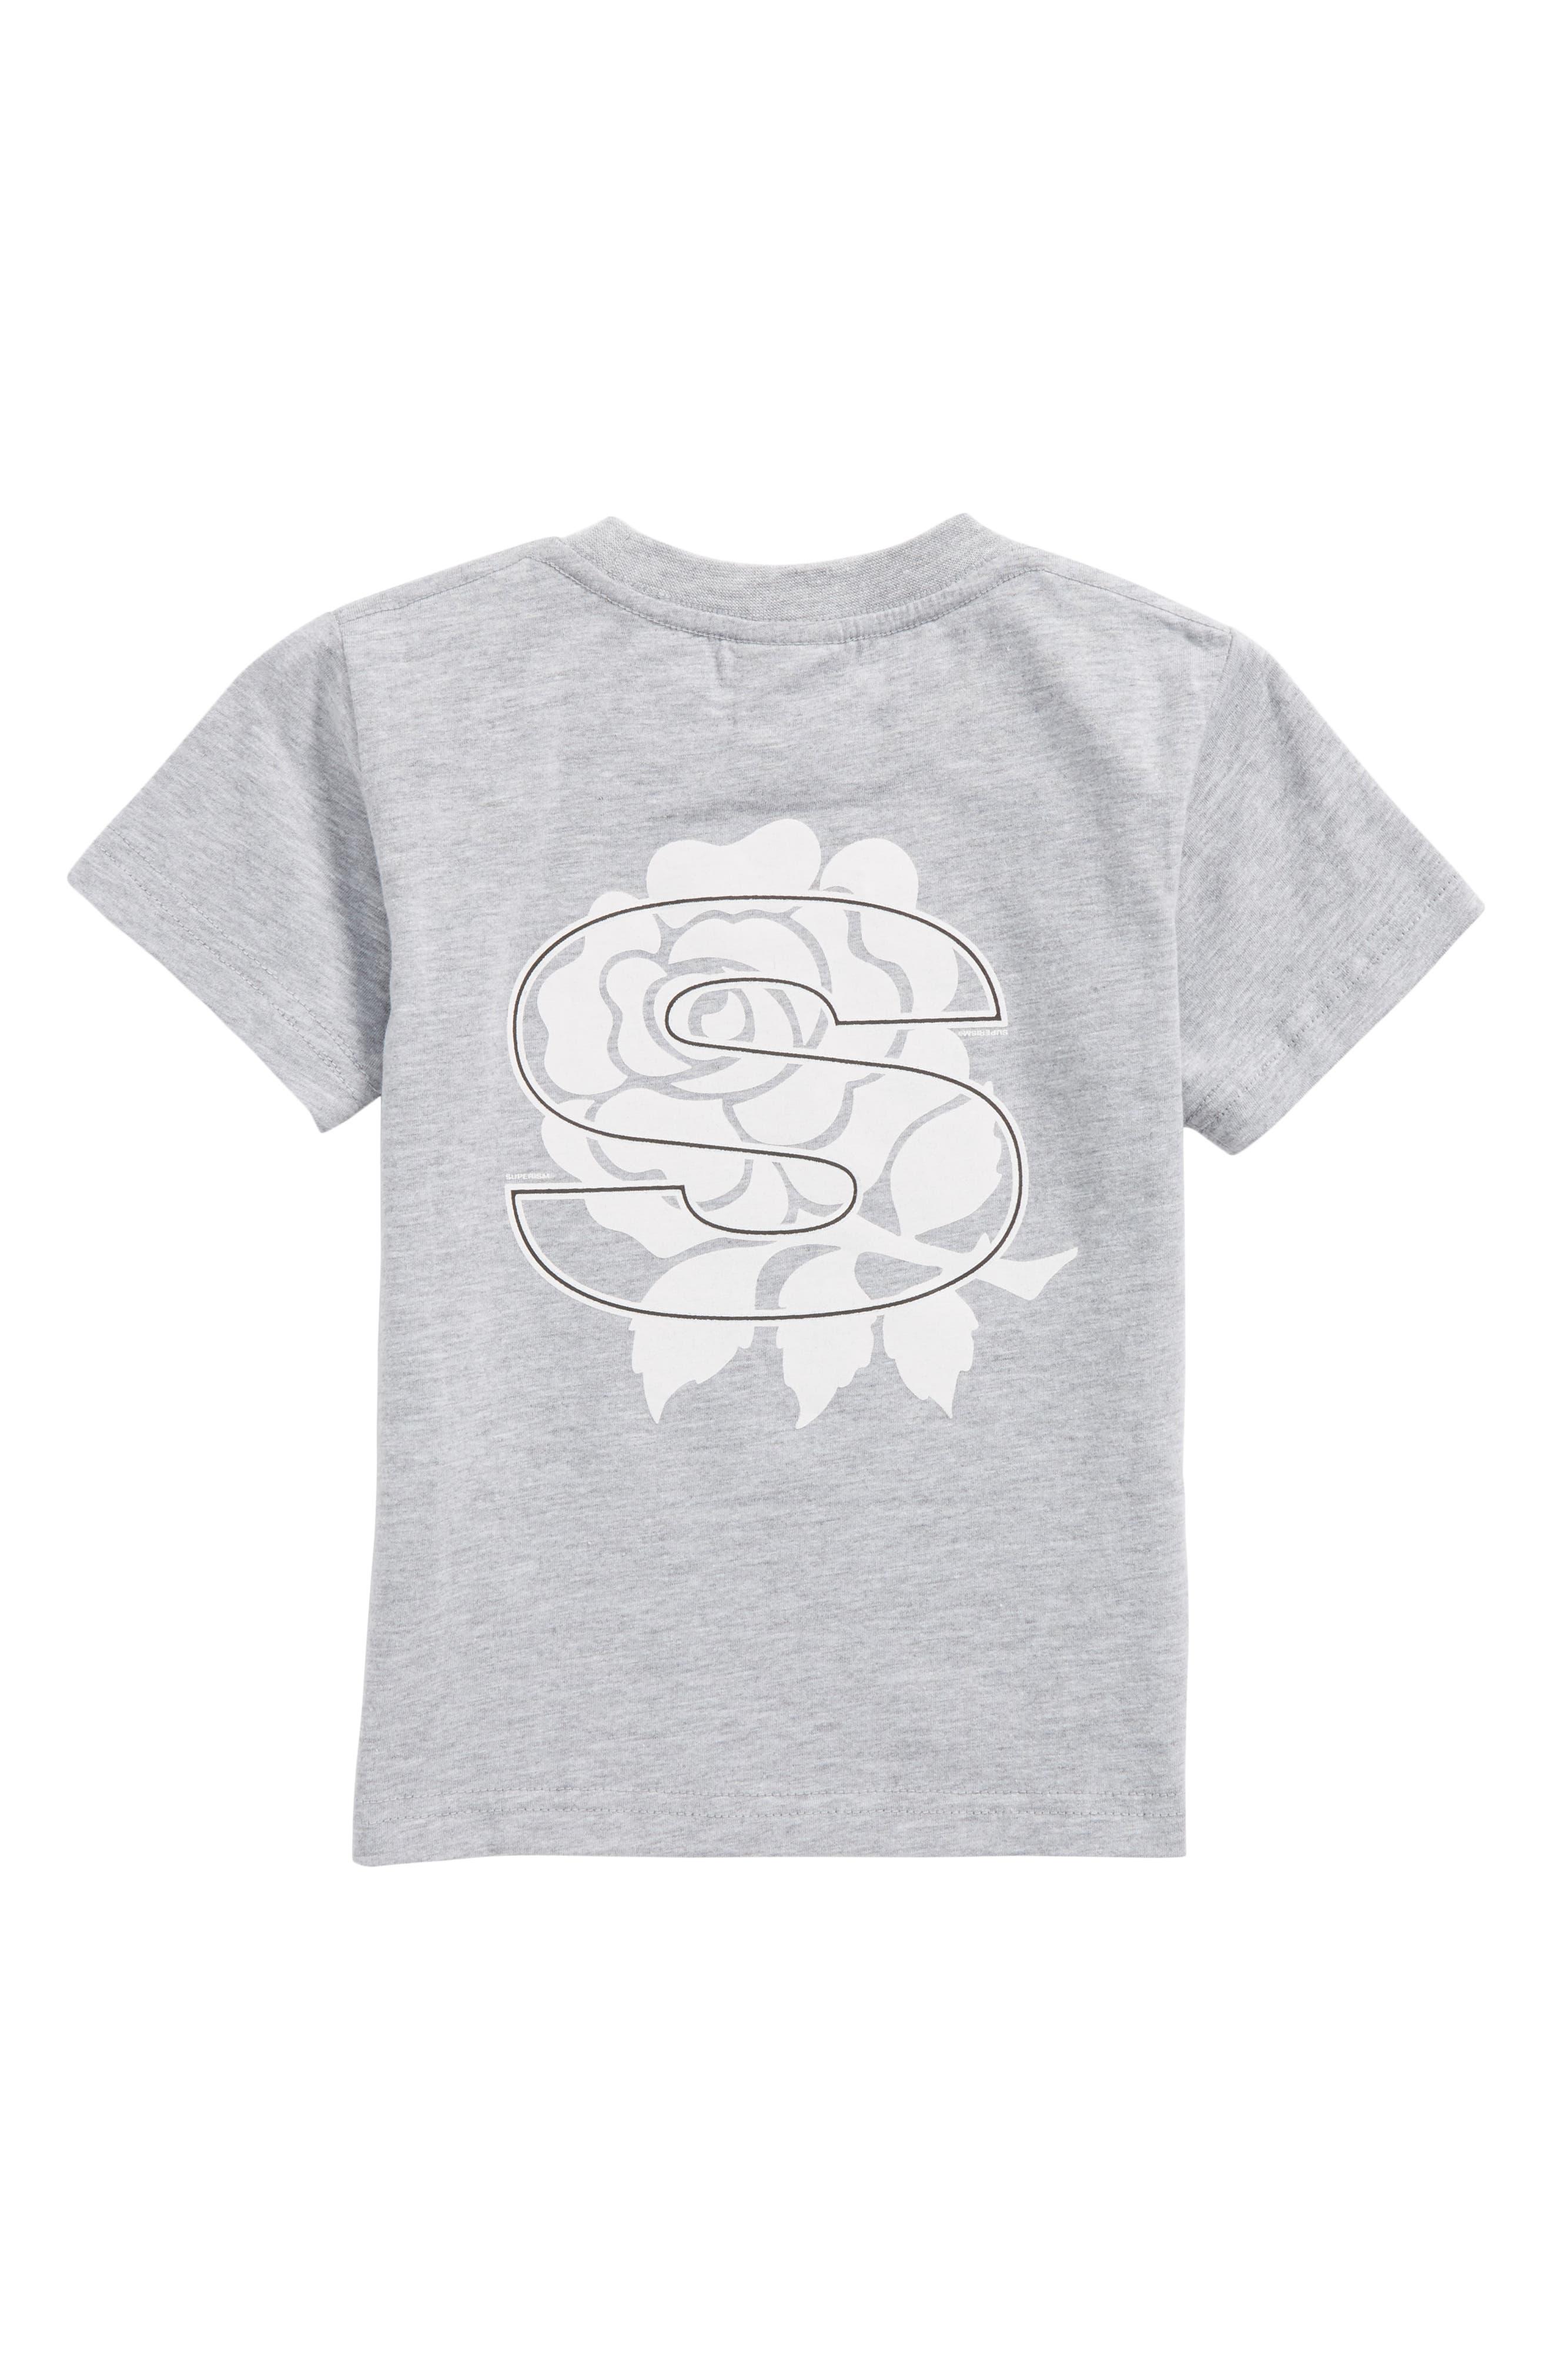 Rose Vision T-Shirt,                             Alternate thumbnail 2, color,                             059